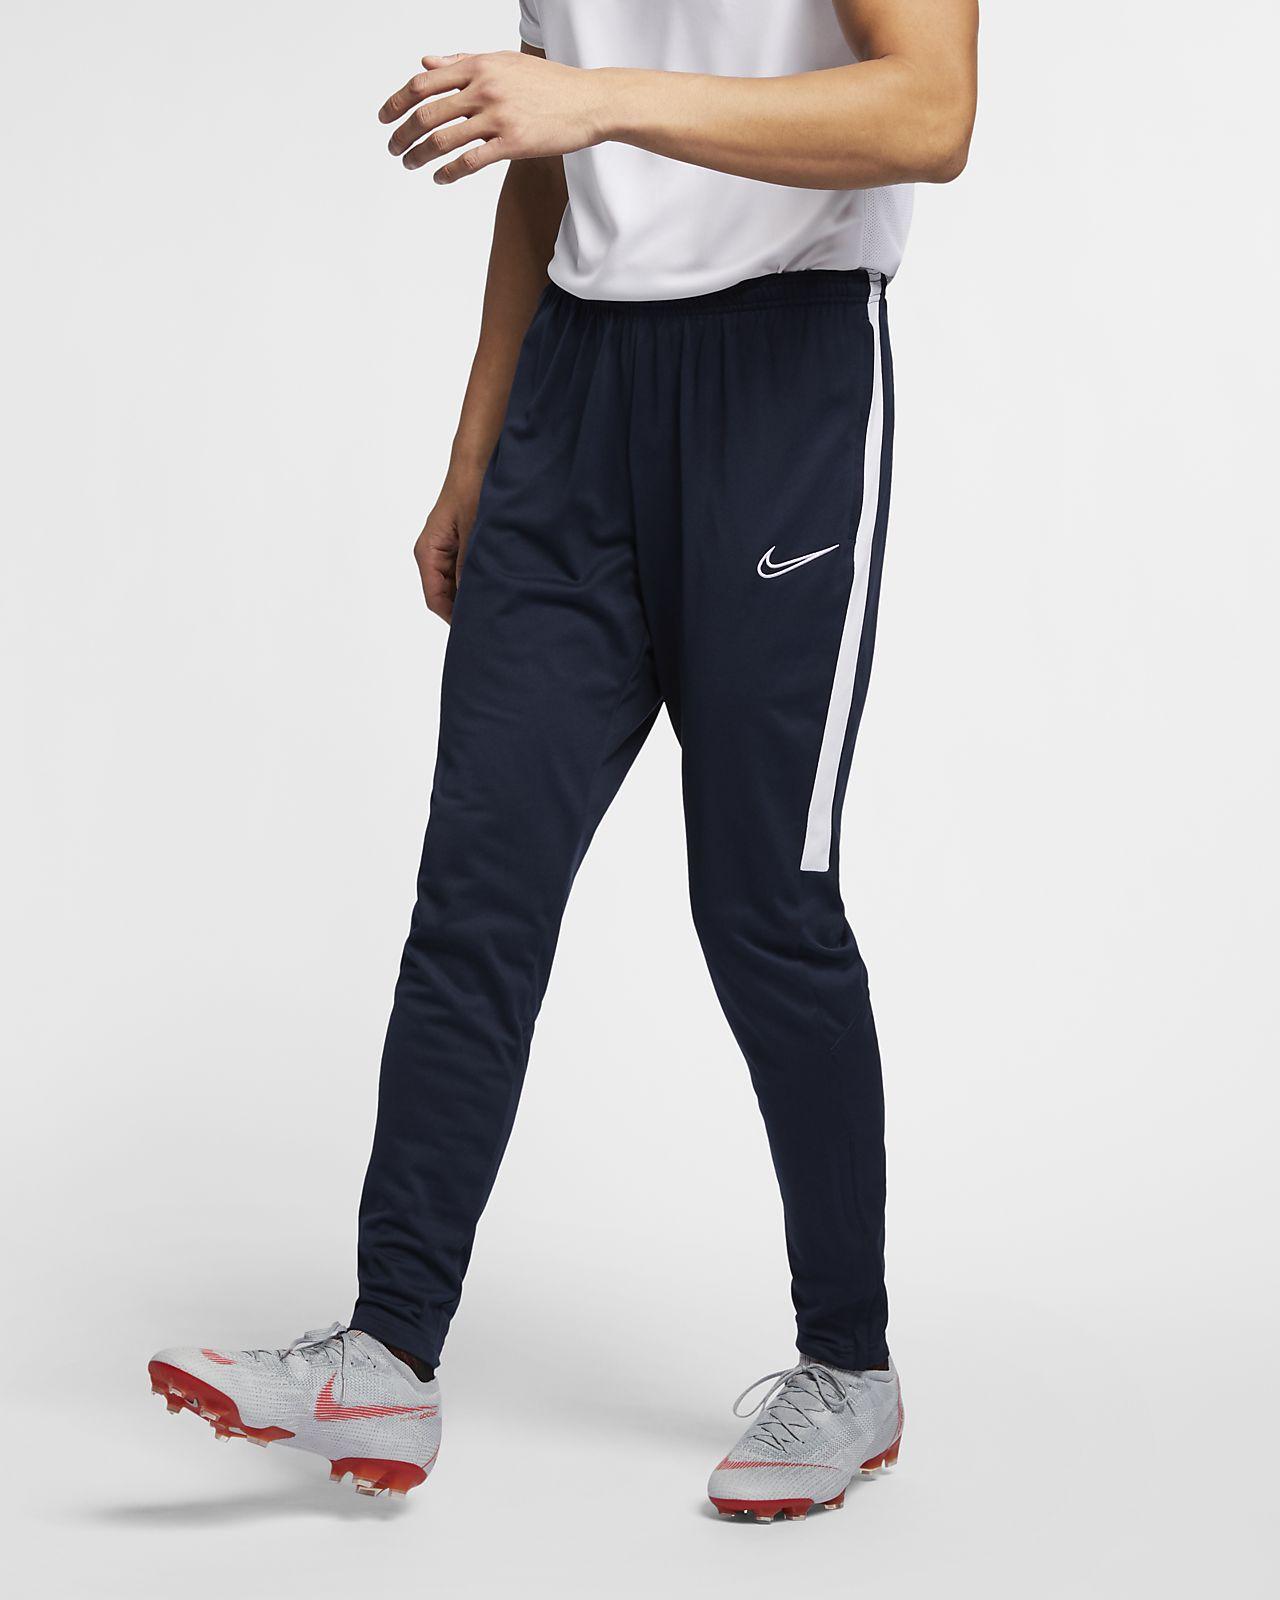 Nike Dri-FIT Academy Men's Soccer Pants